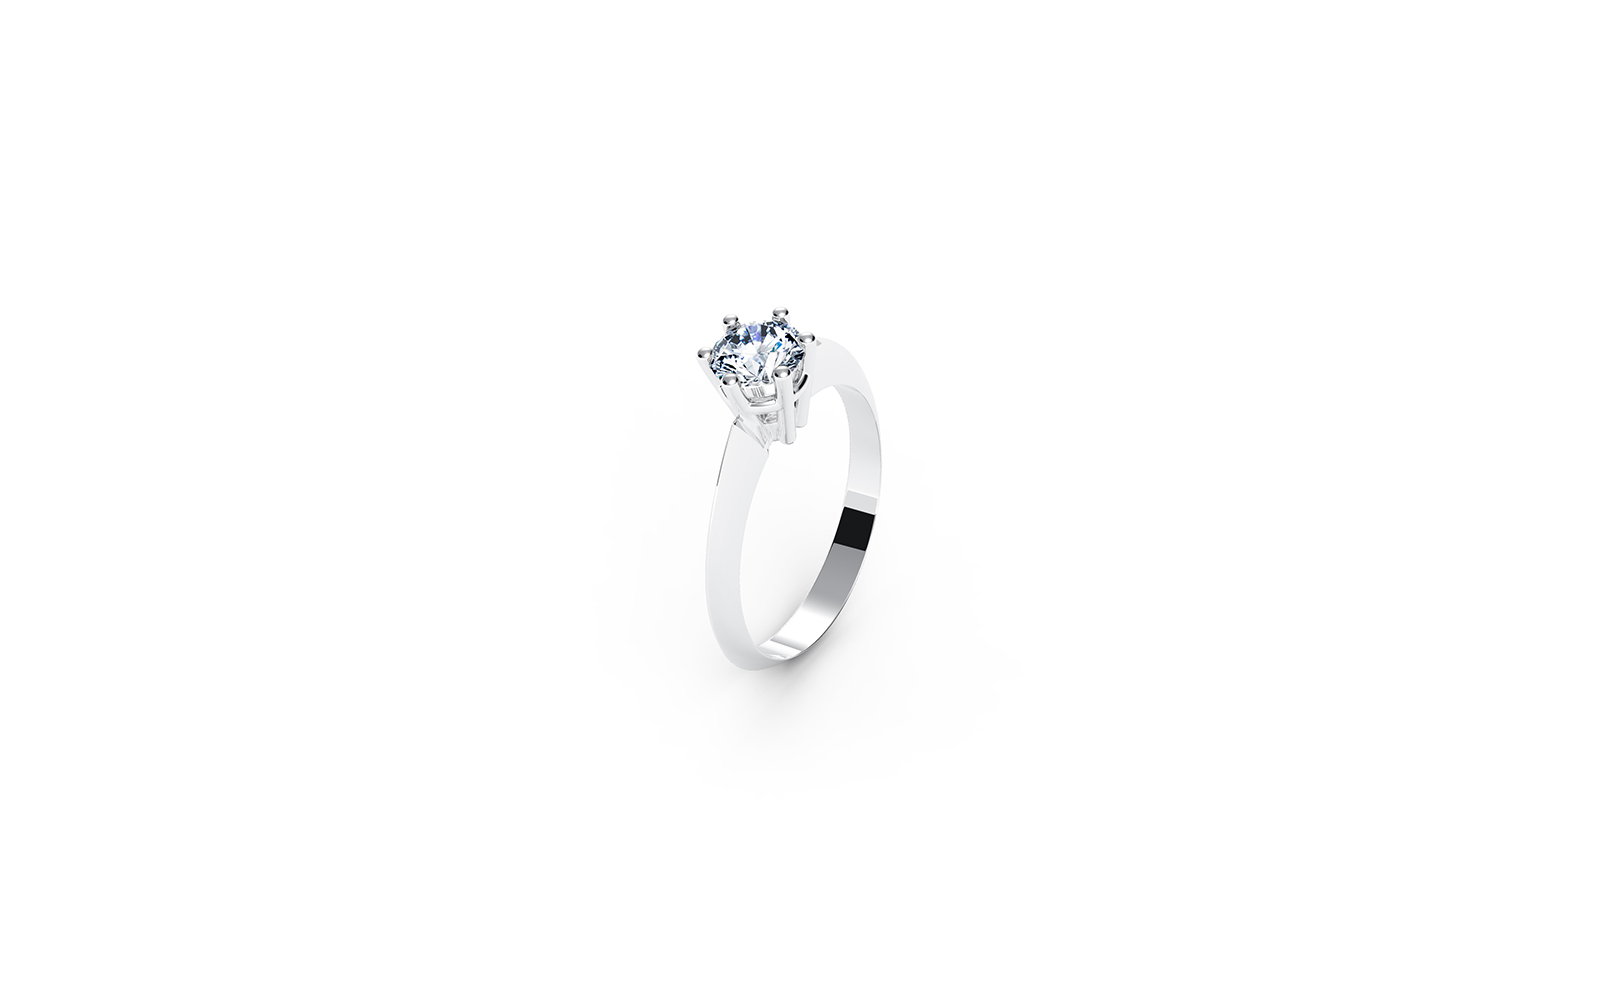 Zlatni prsten s dijamantom_39900kn_Zaks (2)